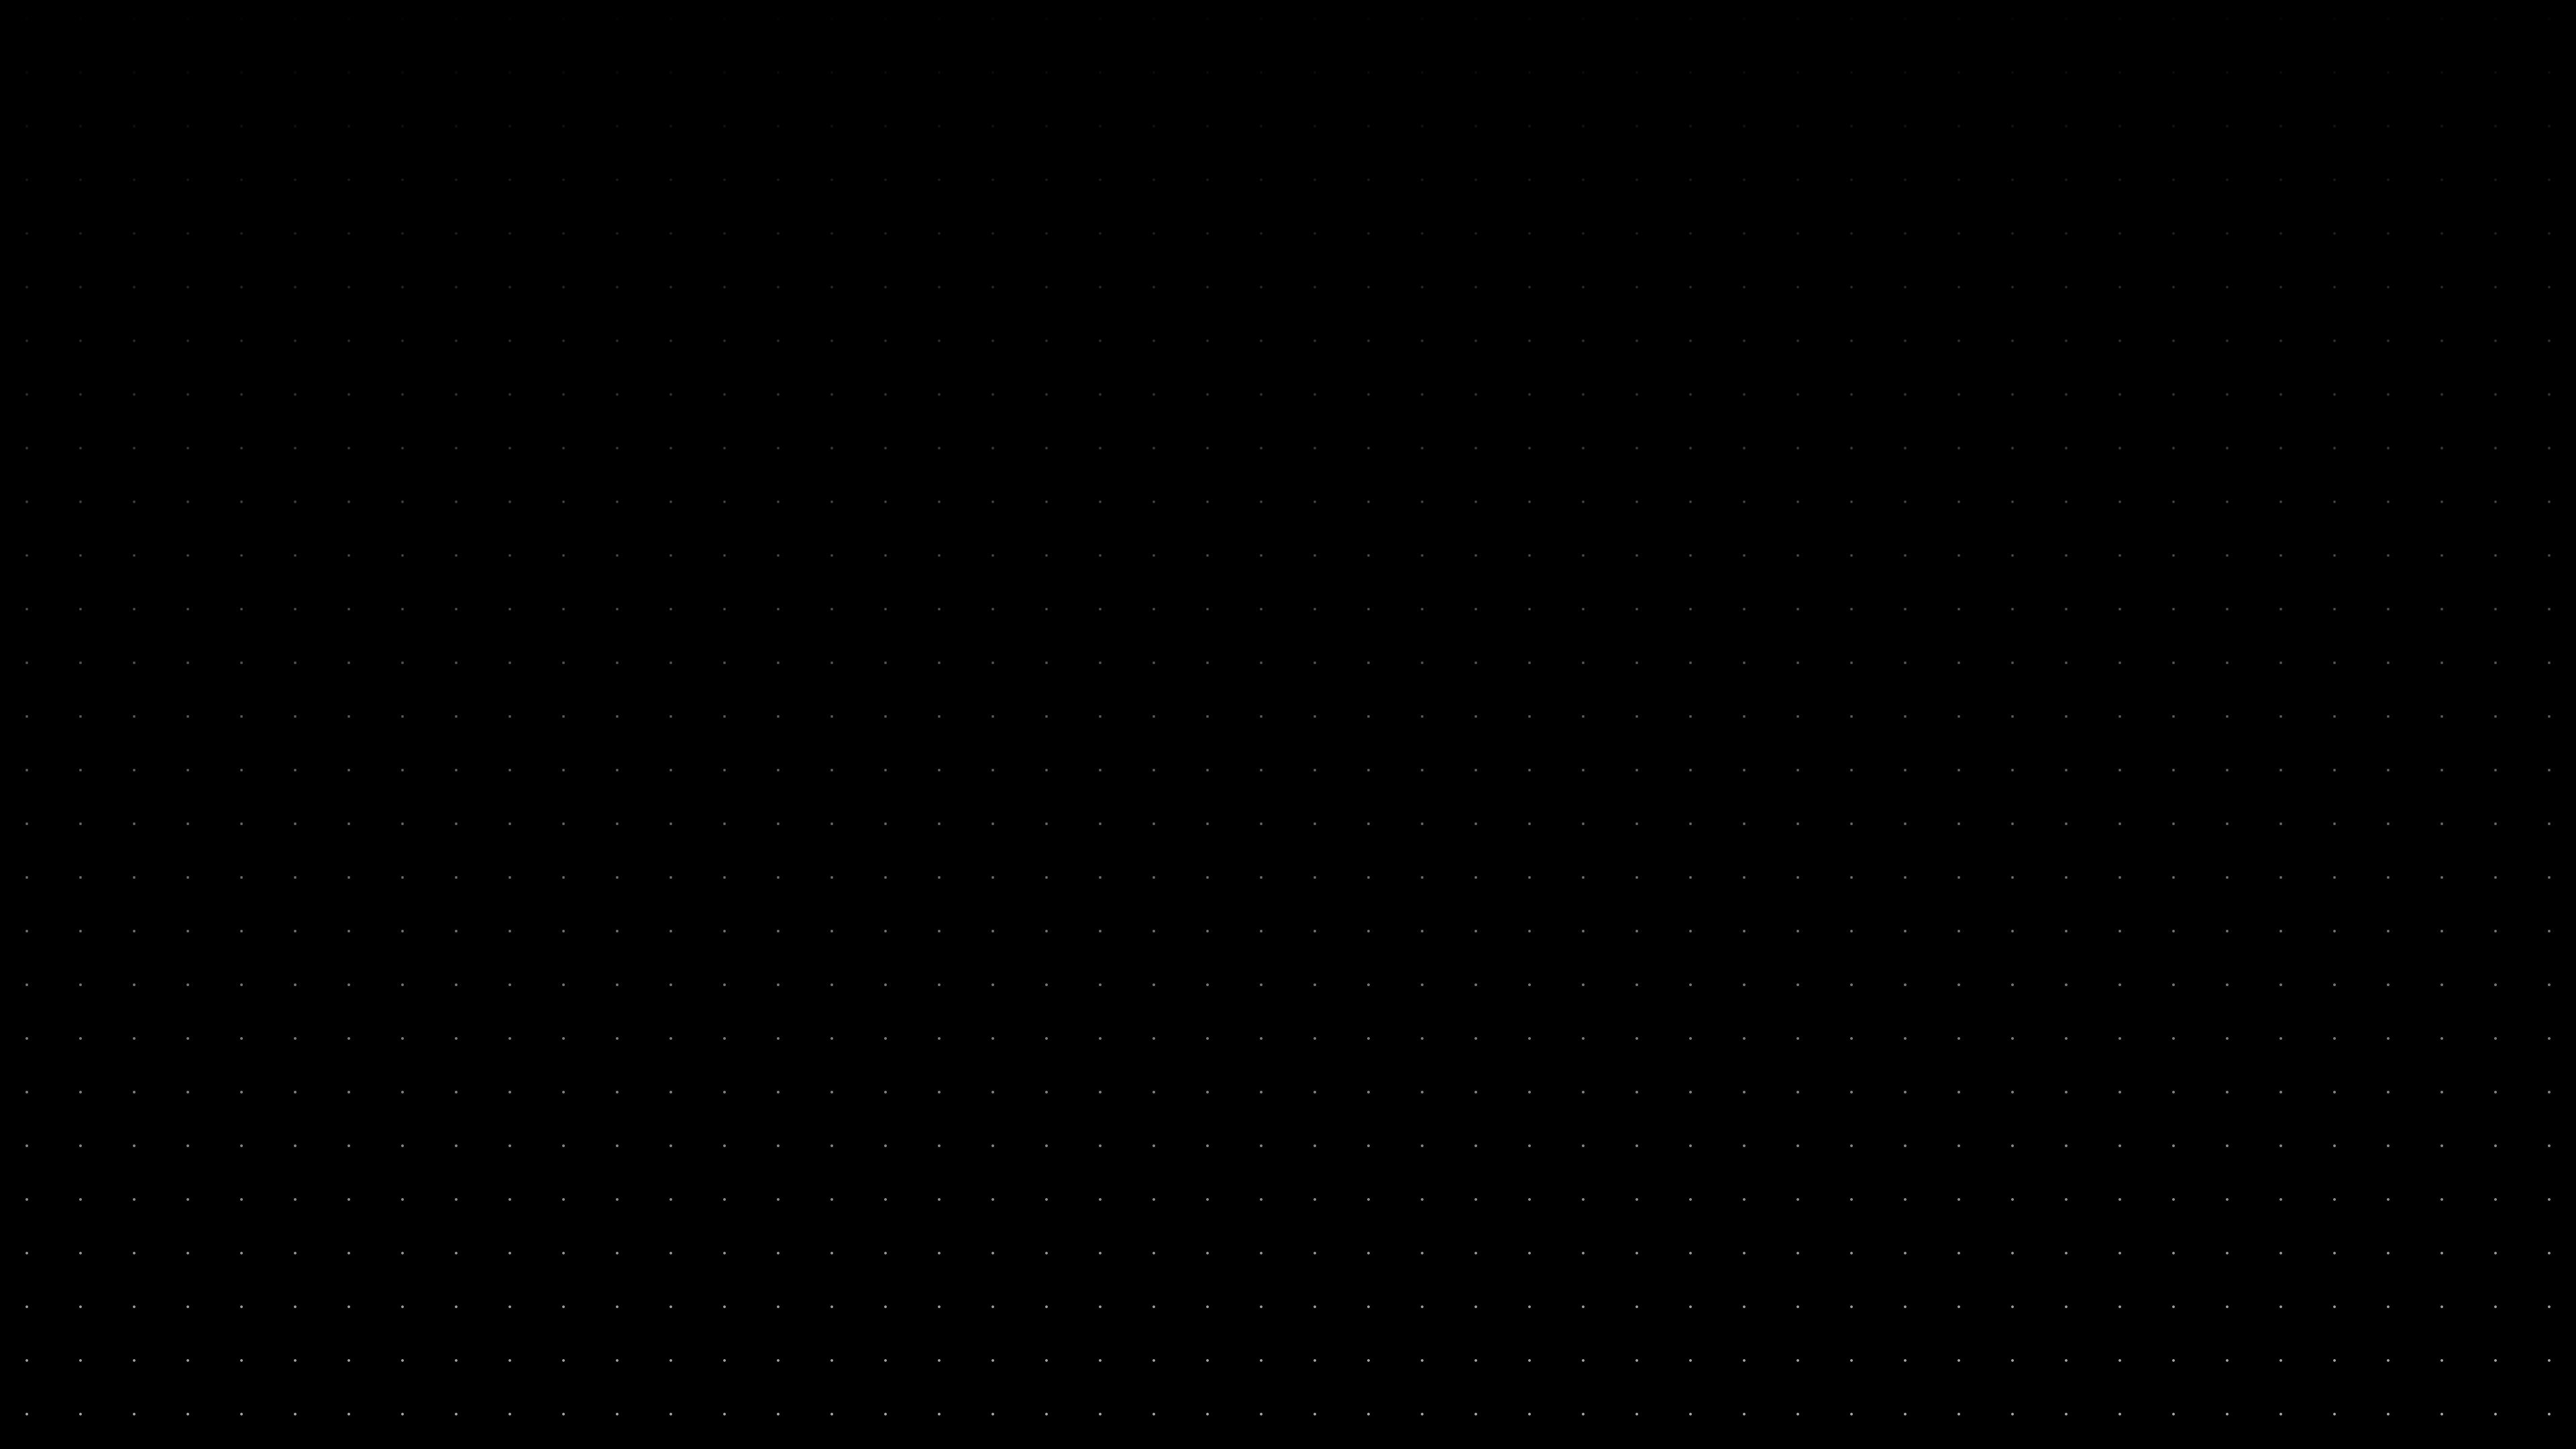 4k Black Wallpapers Top Free 4k Black Backgrounds Wallpaperaccess